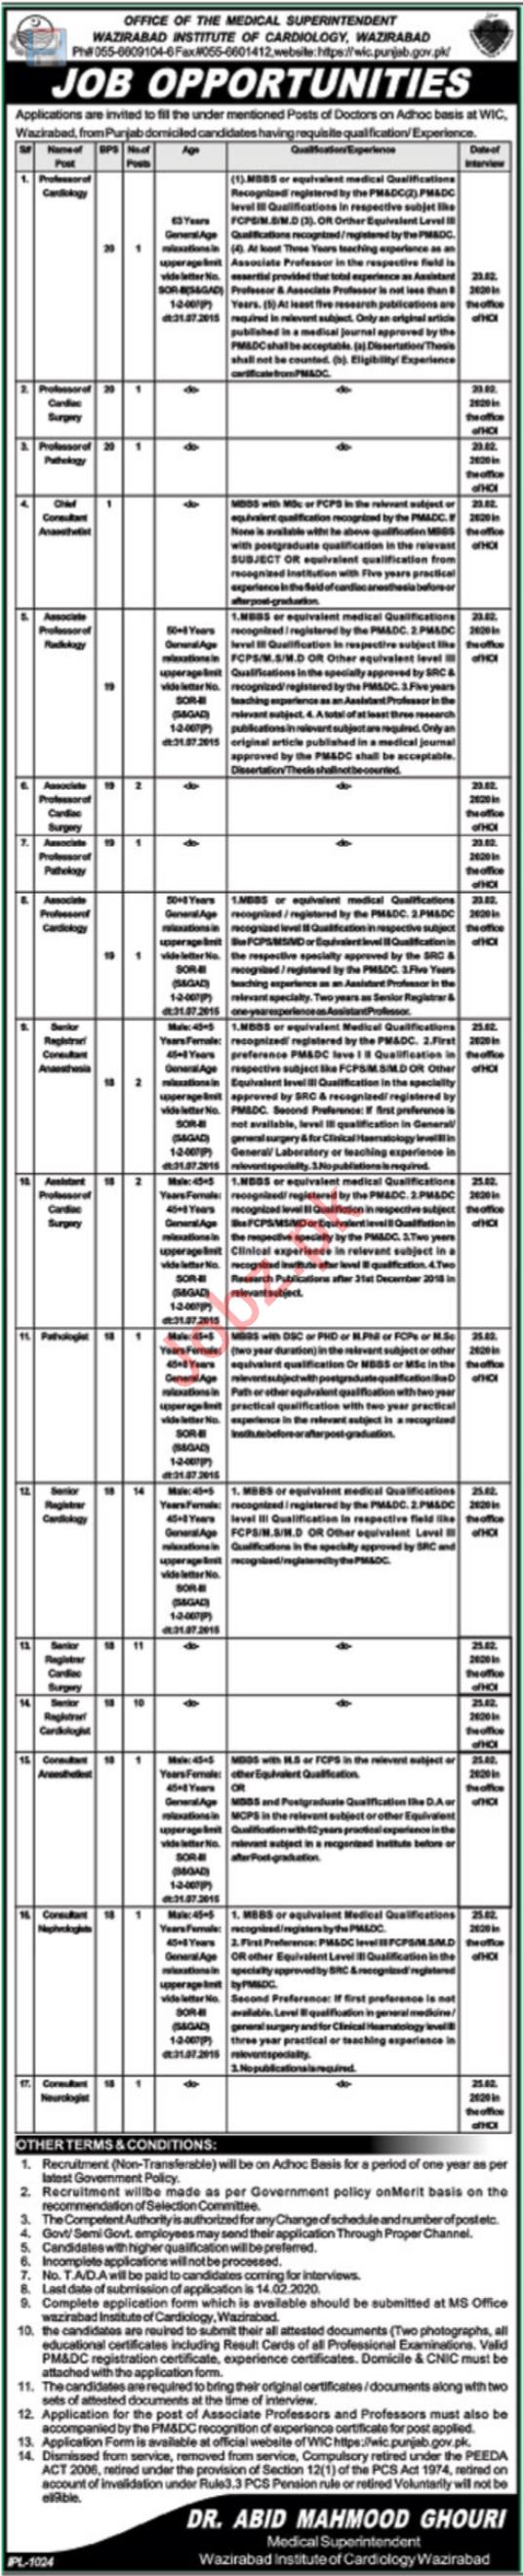 Wazirabad Institute of Cardiology WIC Jobs For Doctors